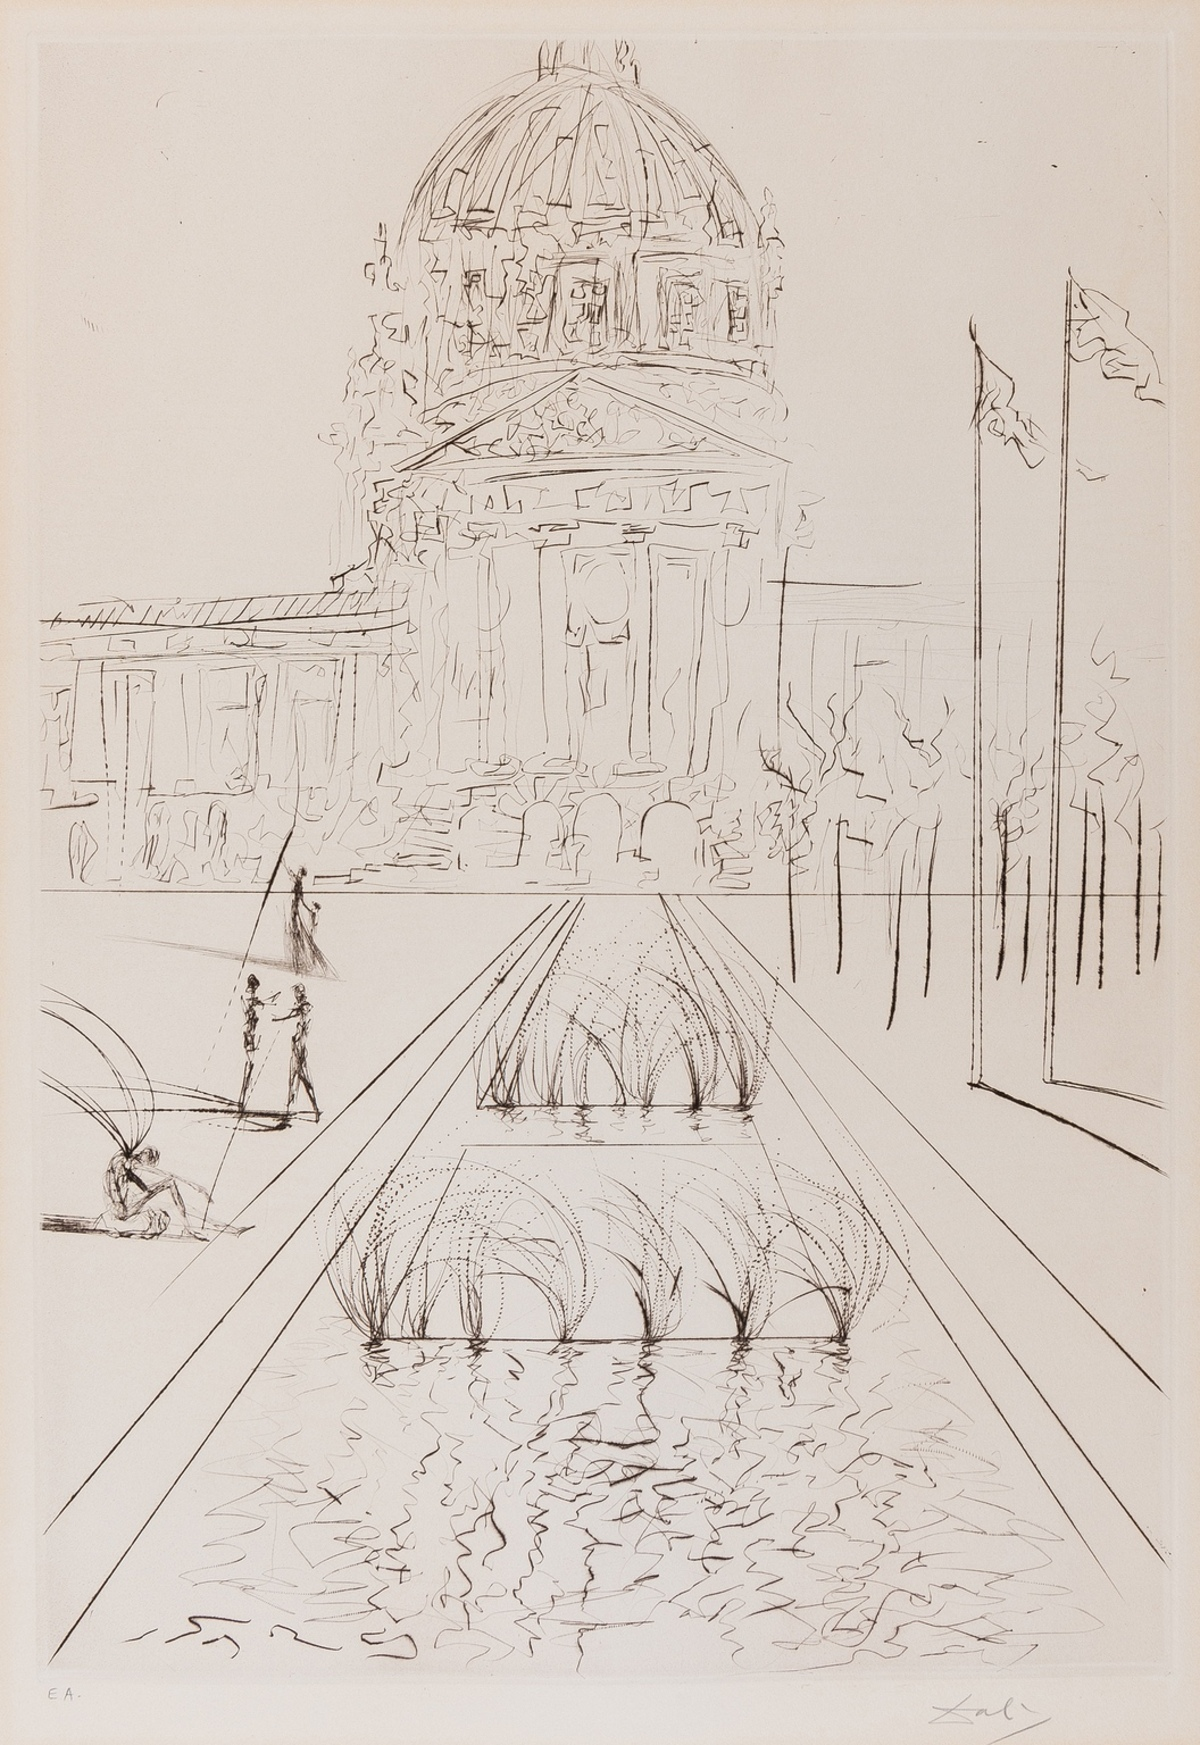 Salvador Dalí (1904-1989) San Francisco. City Hall (Field 70-4-A)